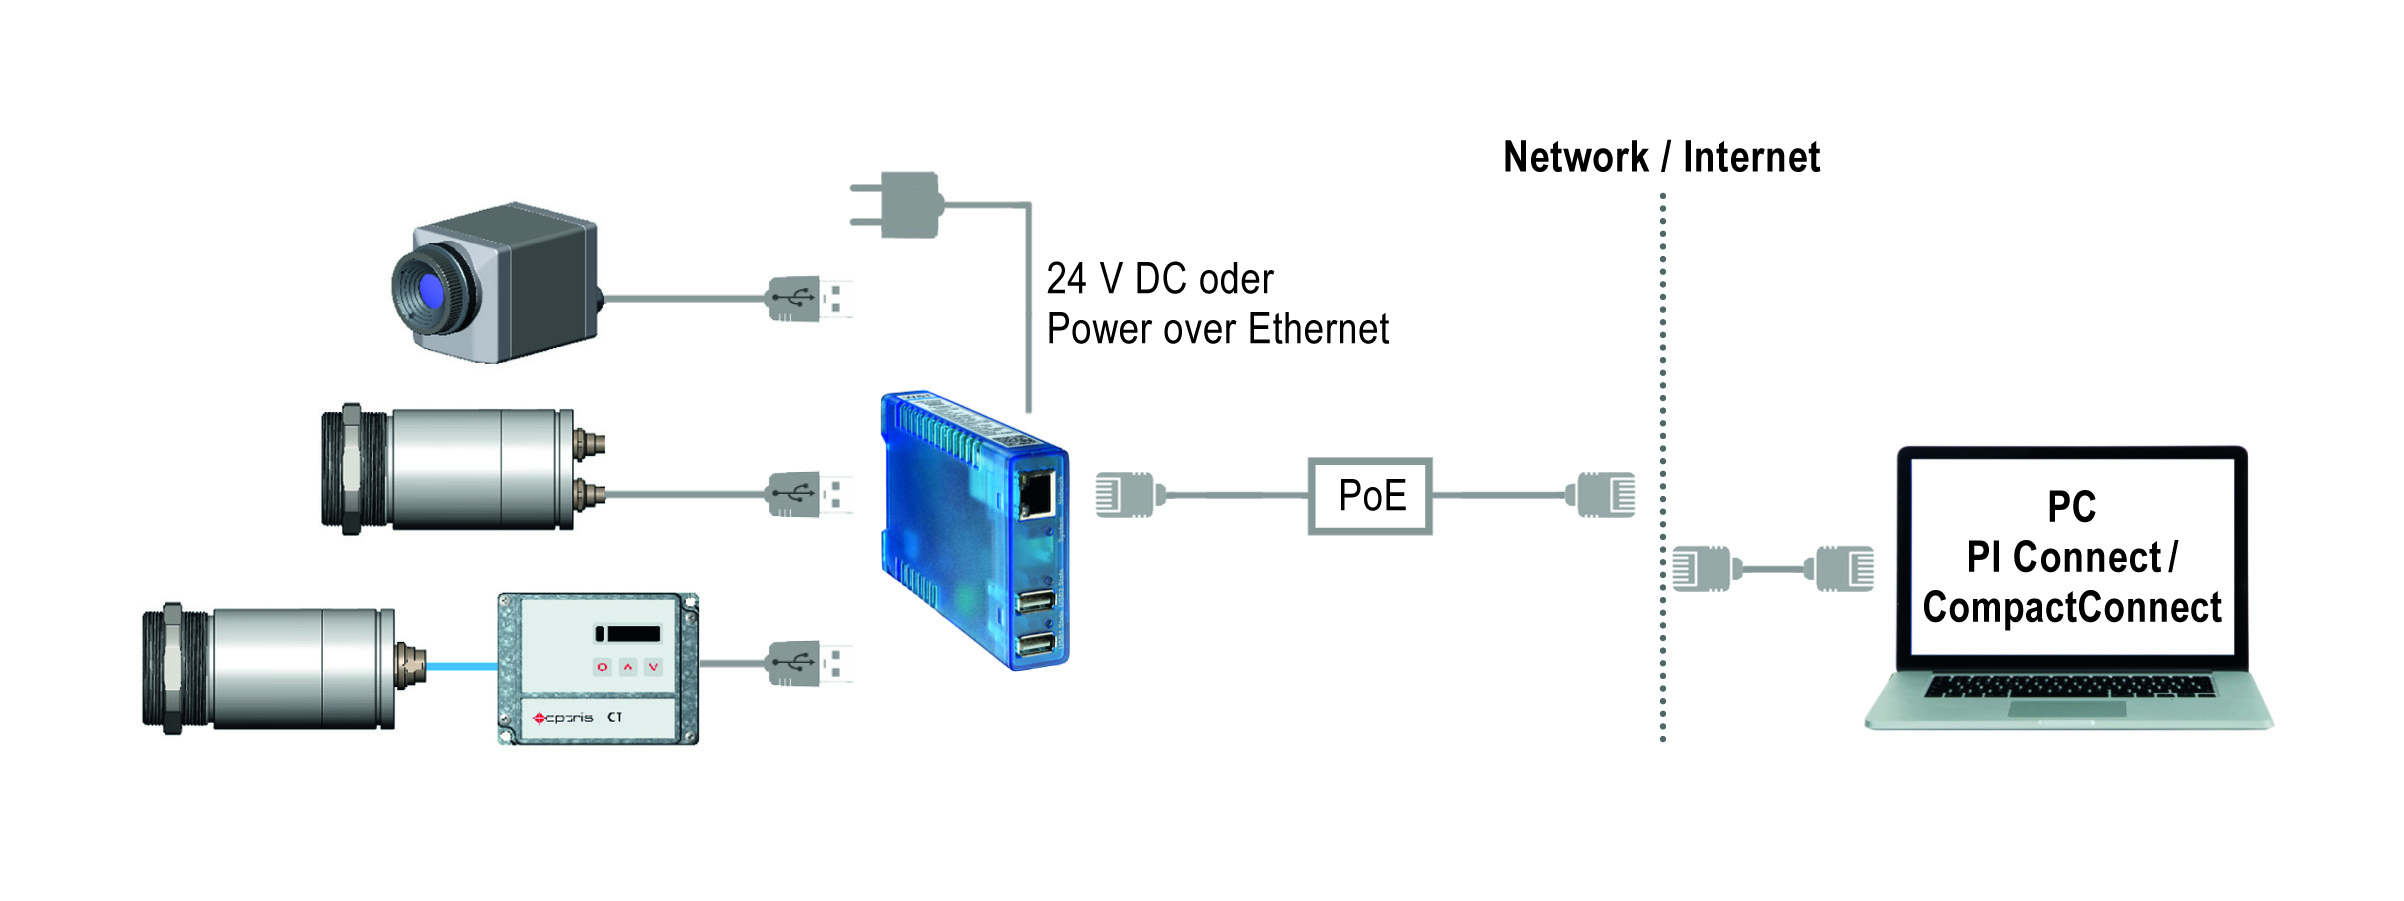 Press Pictures Gallery Sample Internetdiagram2jpg Download Optris Usb Server Gigabit Grafik Weiss